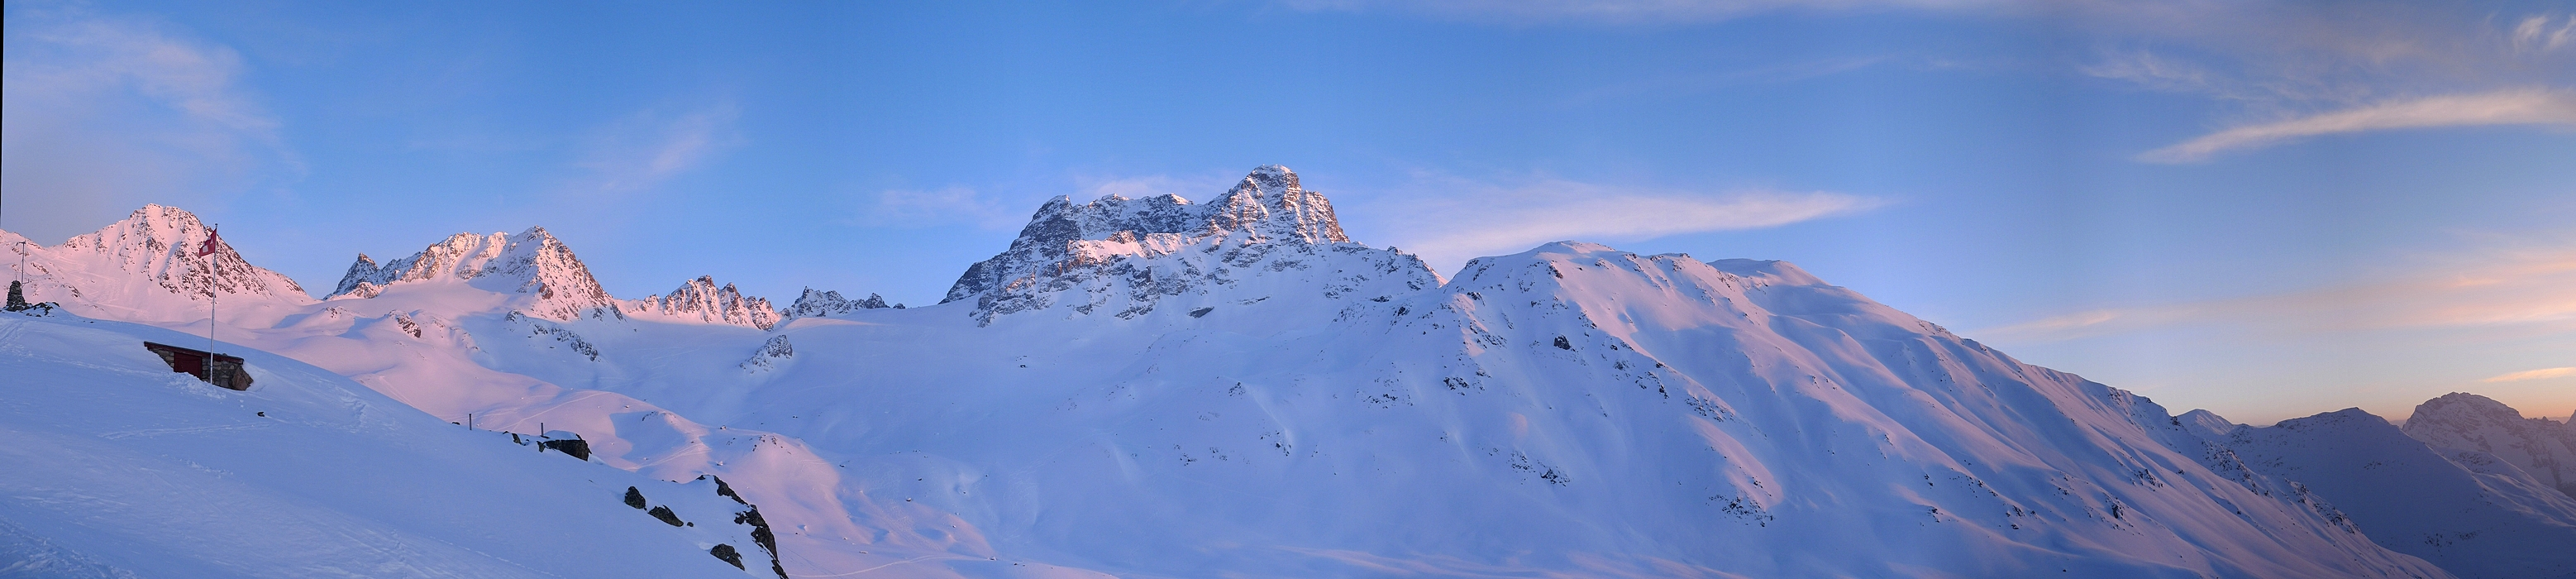 Piz Kesch - Chamanna Kesch Albula Alpen Švýcarsko panorama 49